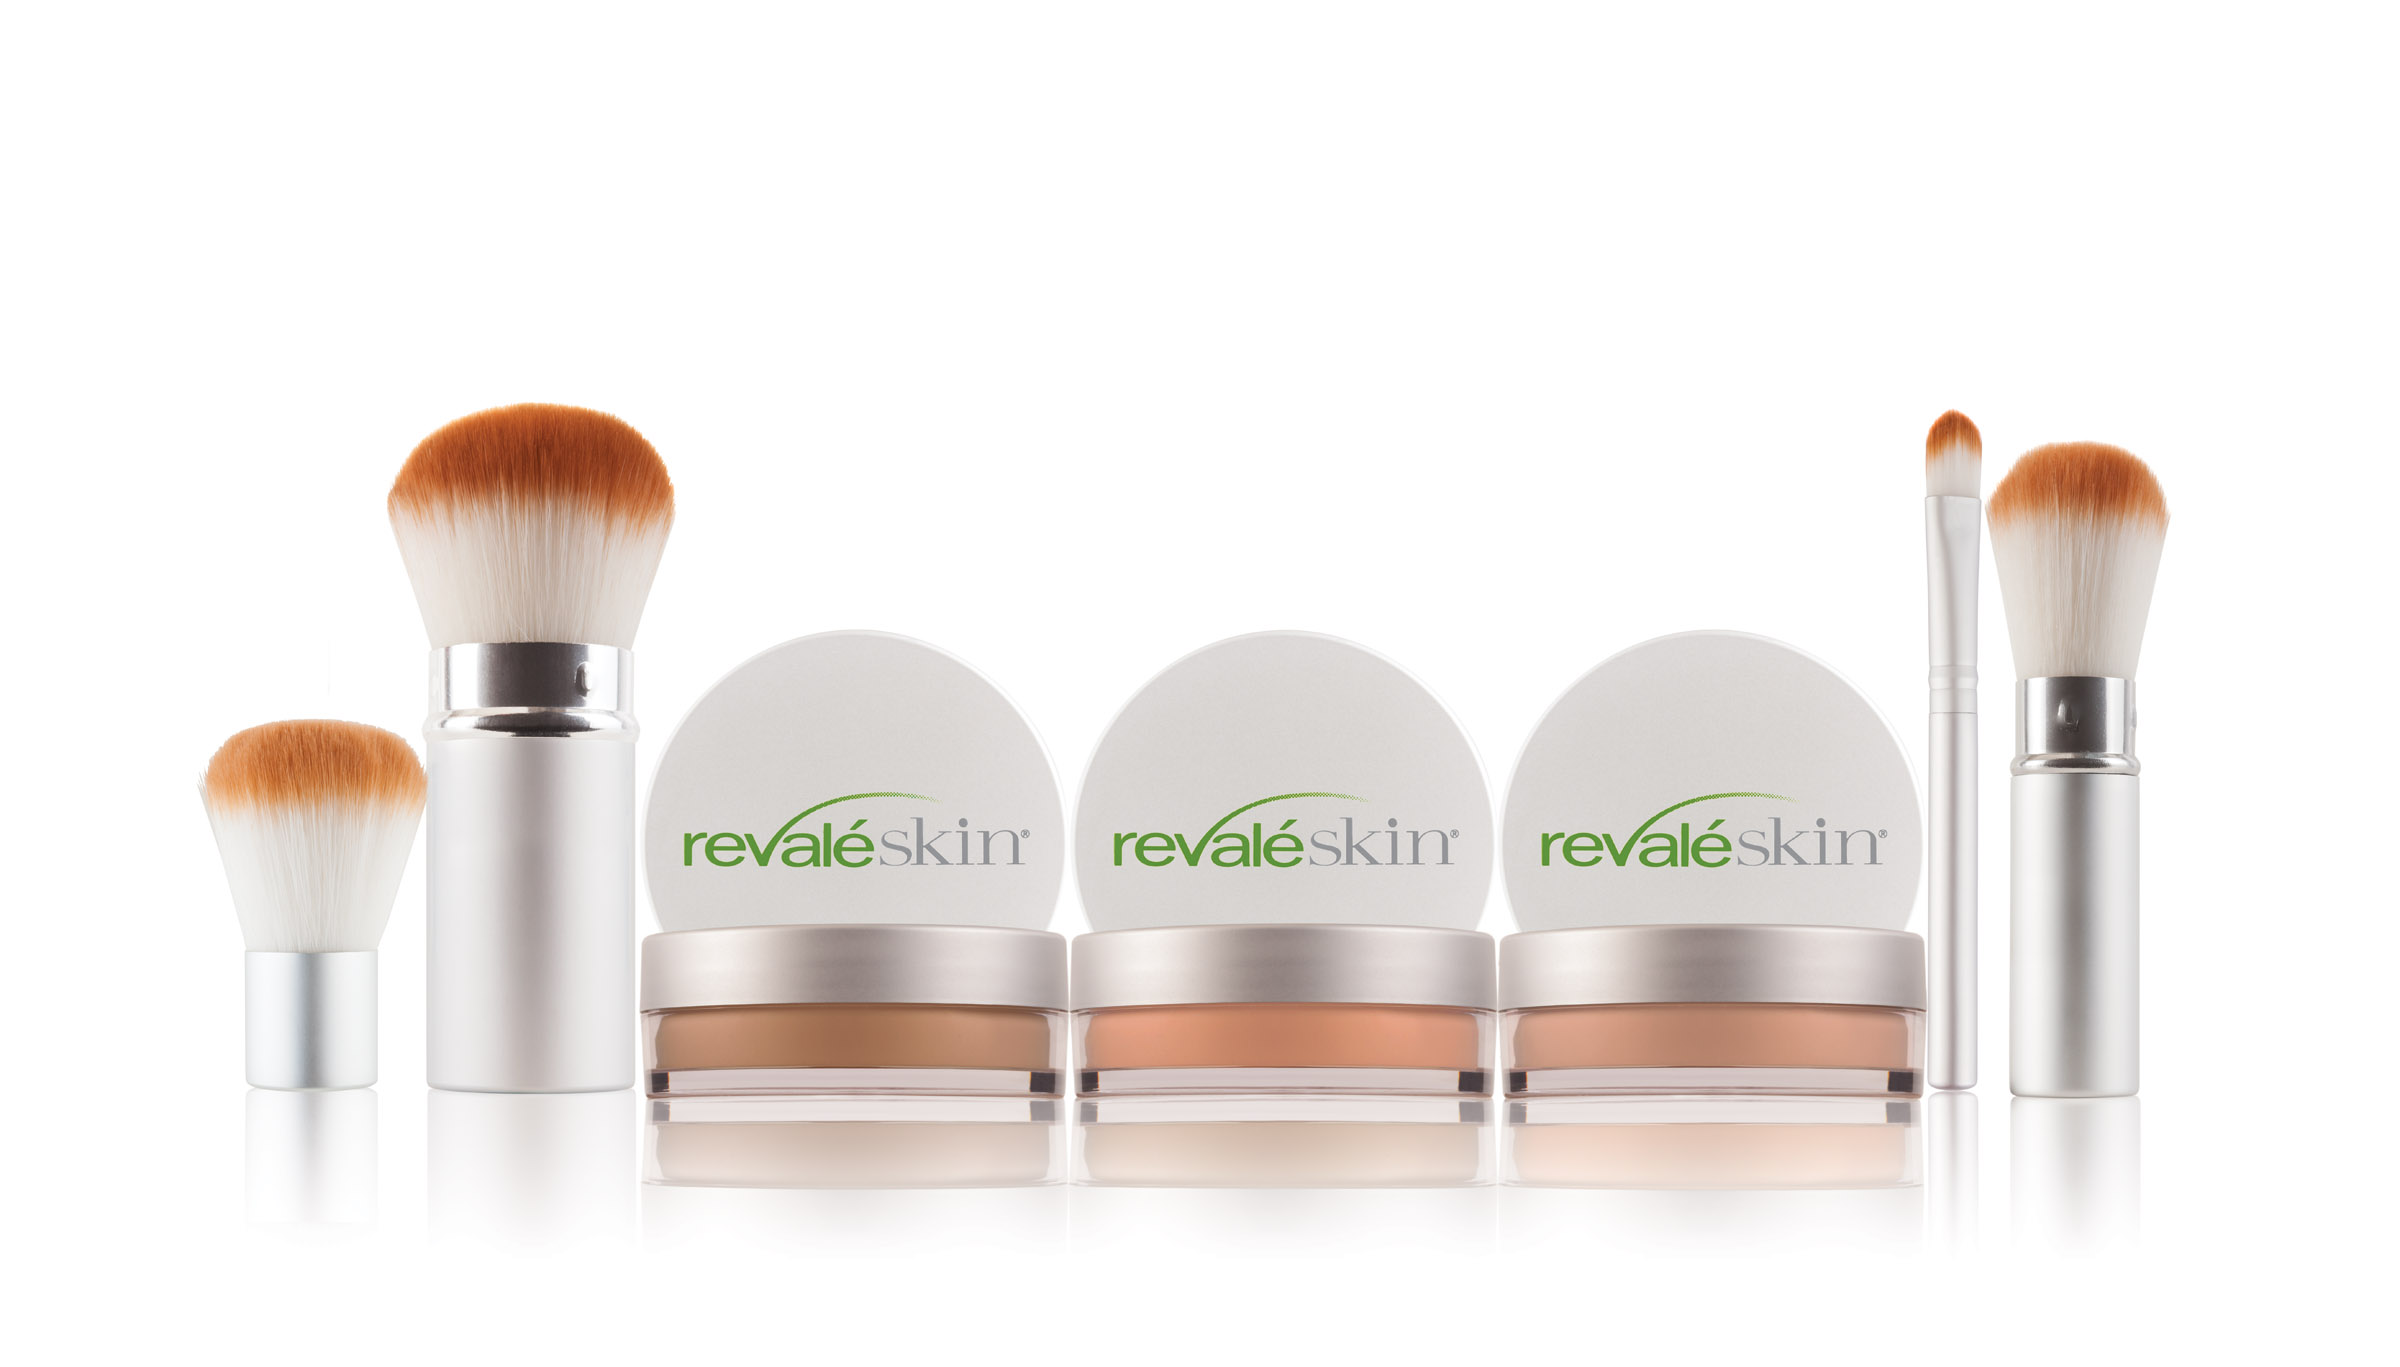 revaleskin-mineral-skincare-group